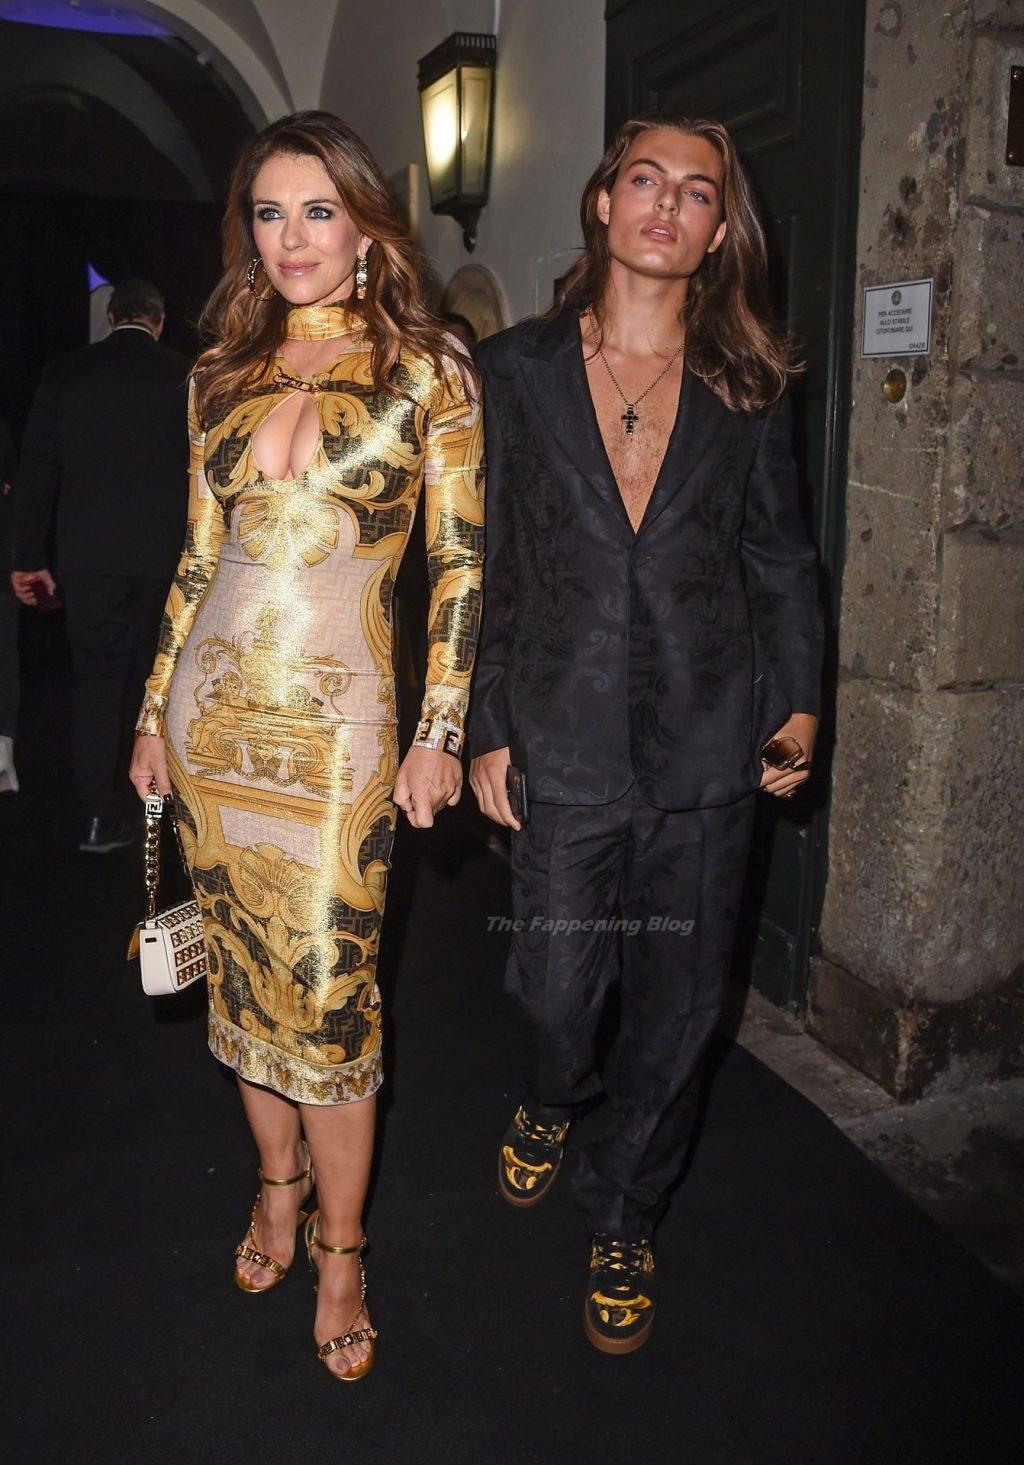 Elizabeth Hurley Flaunts Her Cleavage in Milan (42 Photos)